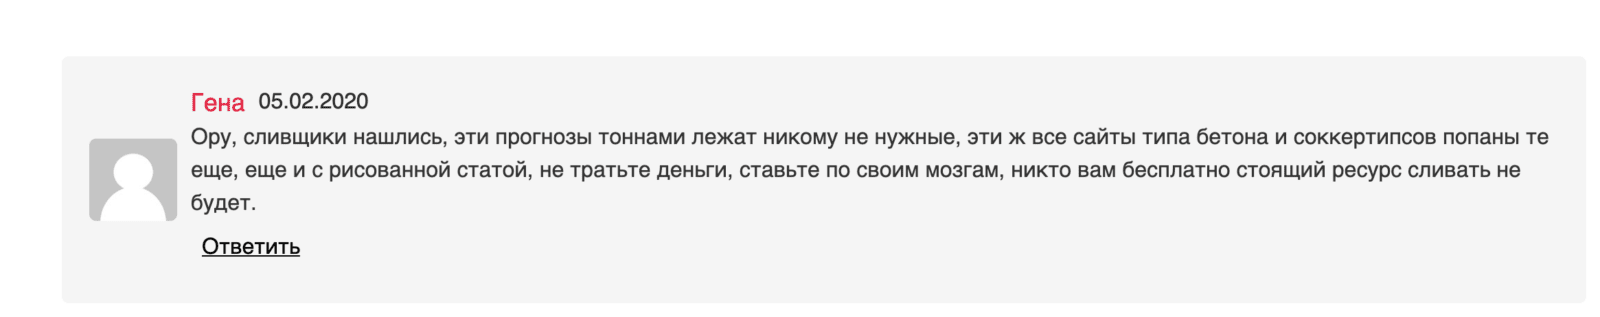 Отзывы о телеграм канале Ducks Sliv Bet